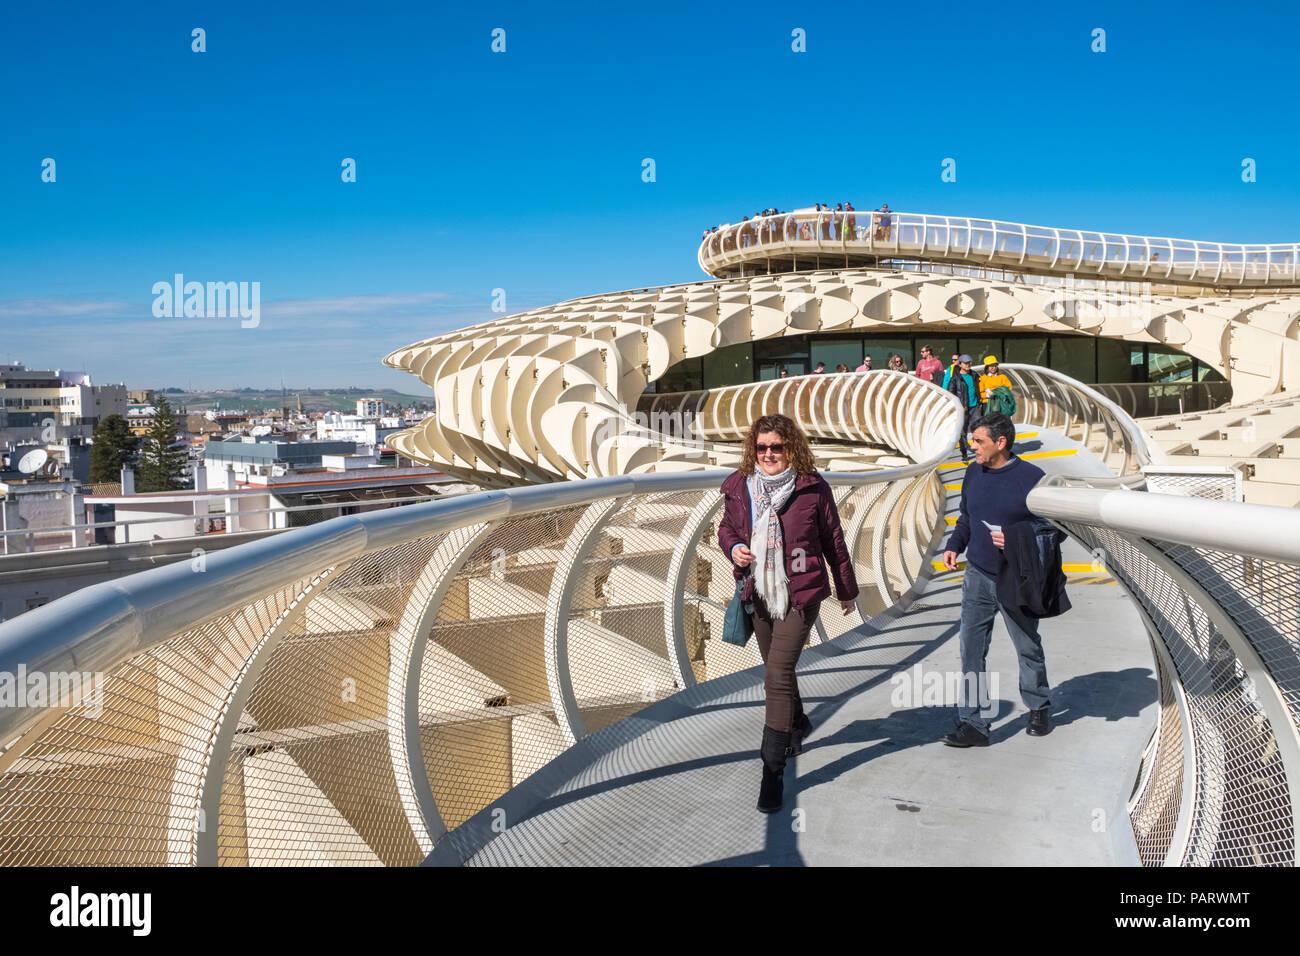 Metropol Parasol, Espacio Metropol Parasol, Incarnation Square, Plaza de la Encarnation, Seville, Spain, Europe - people walking - Stock Image